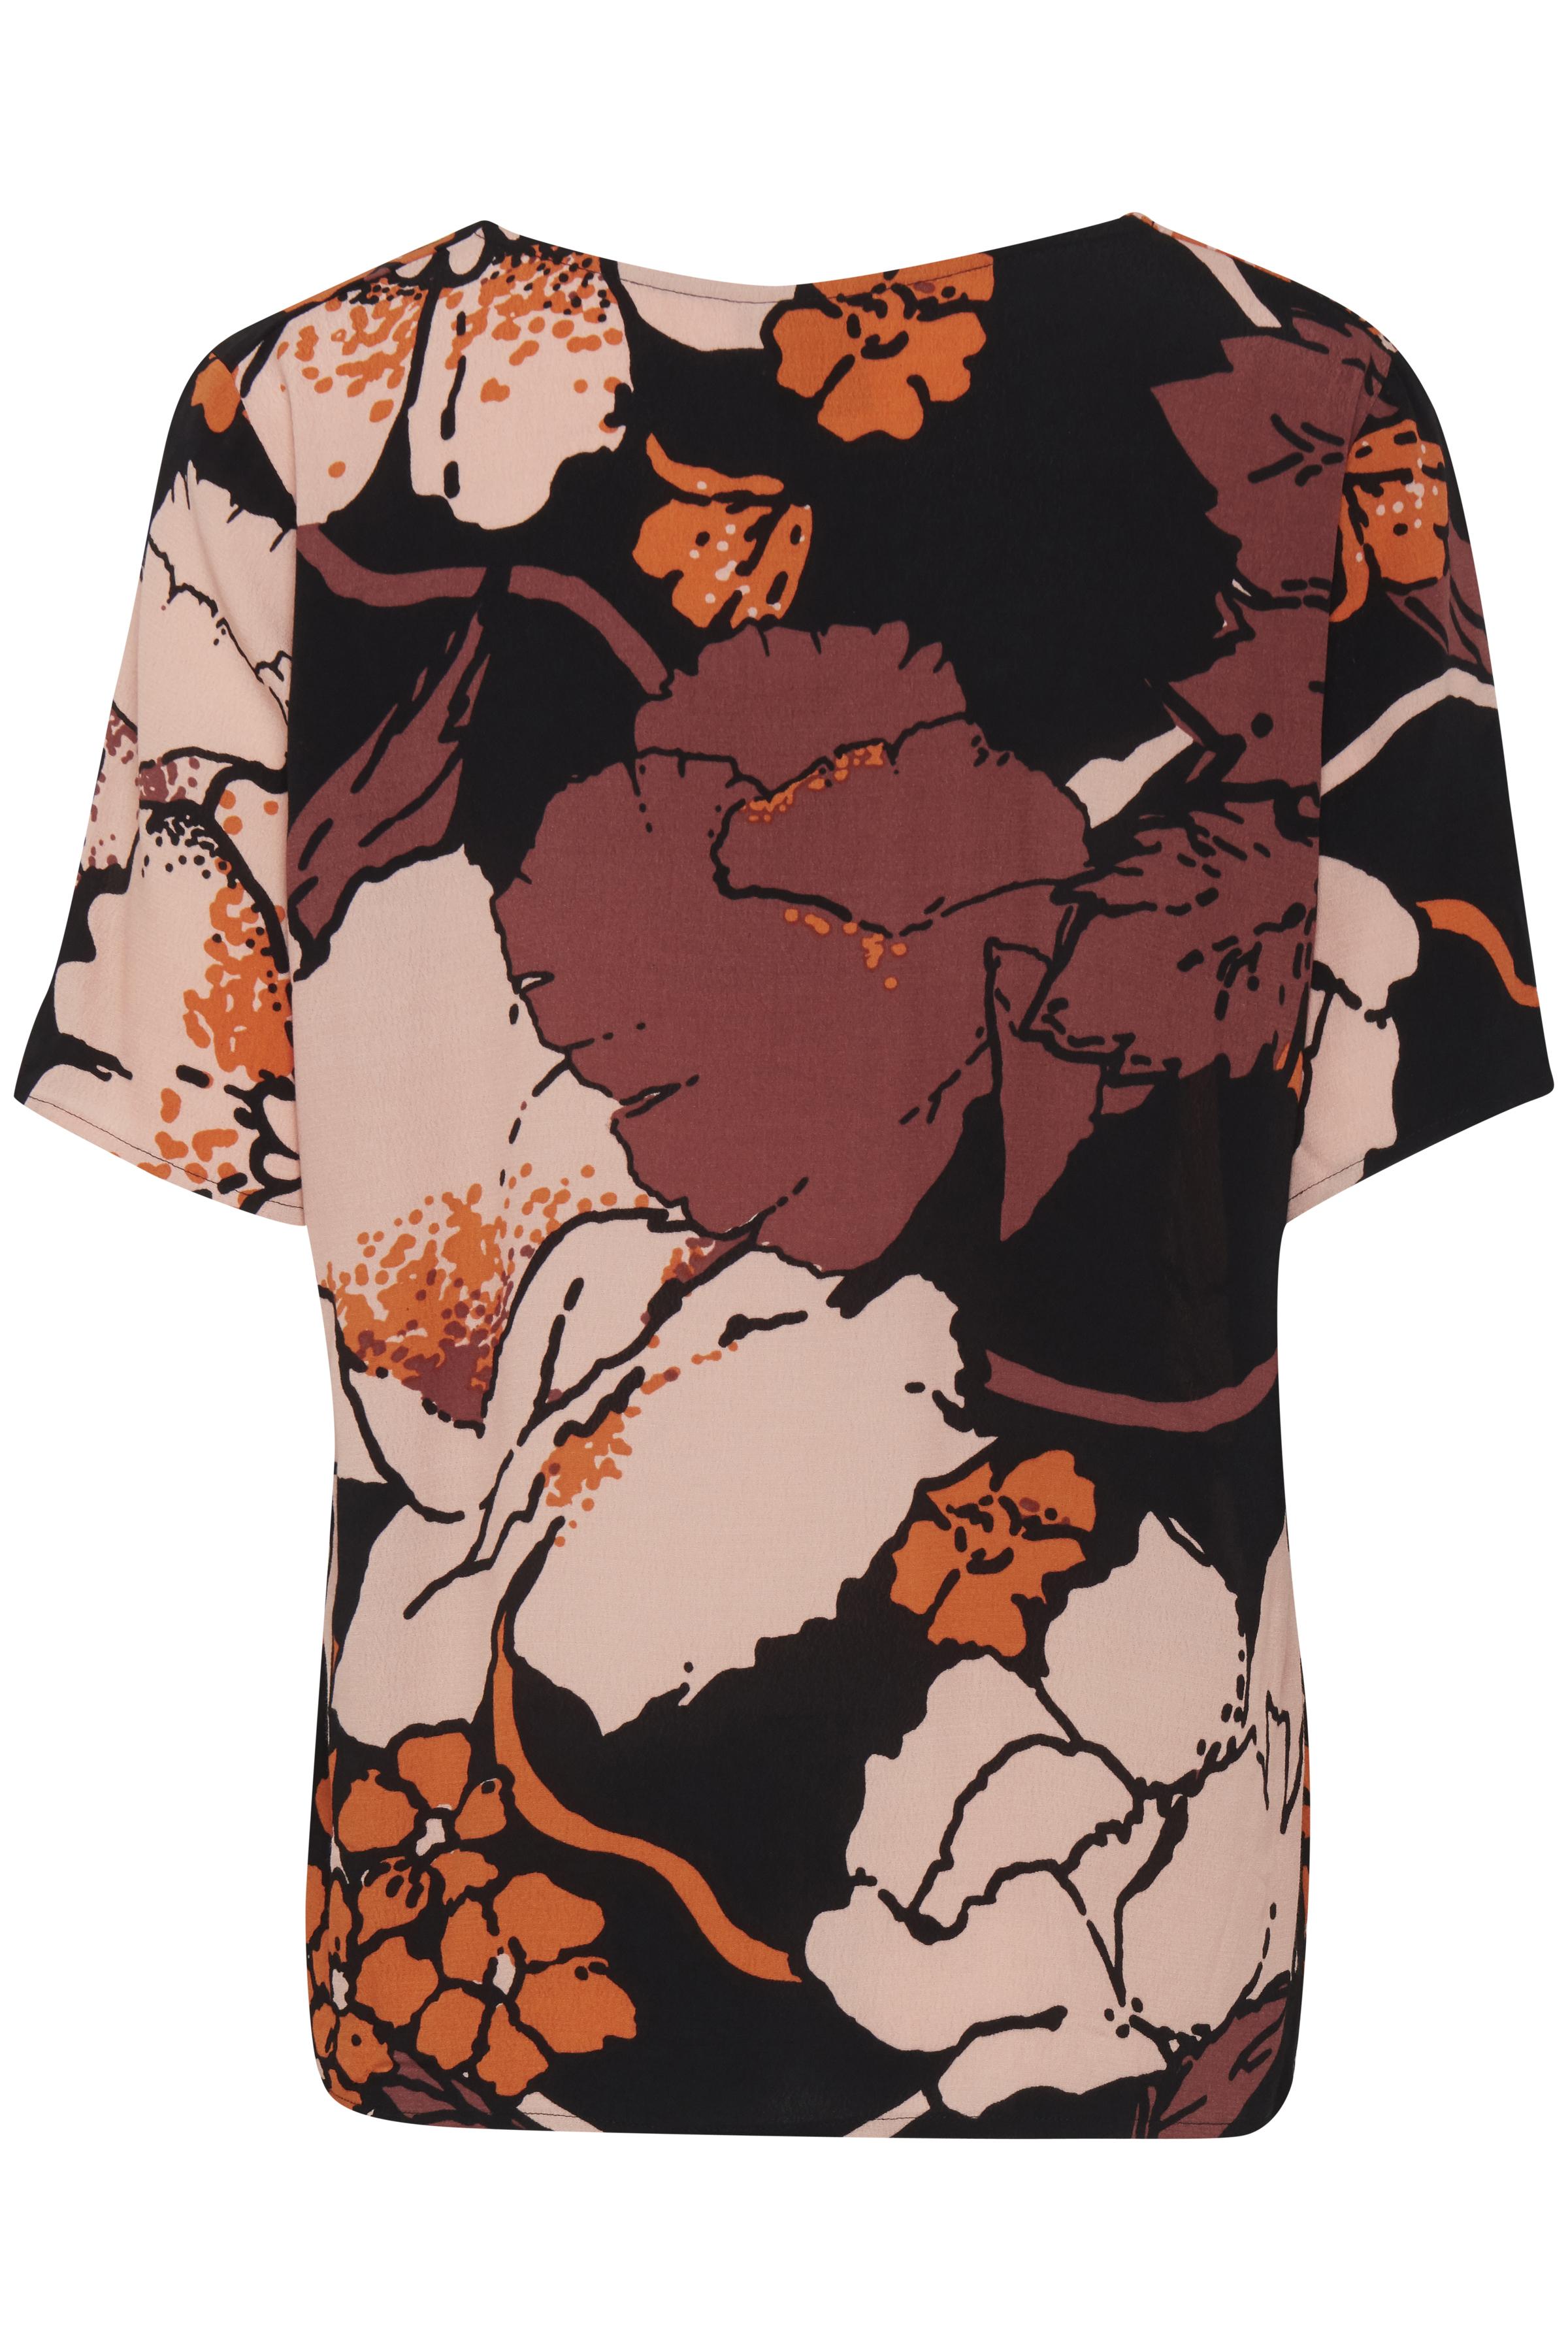 Black Skjorte – Køb Black Skjorte fra str. XS-XL her